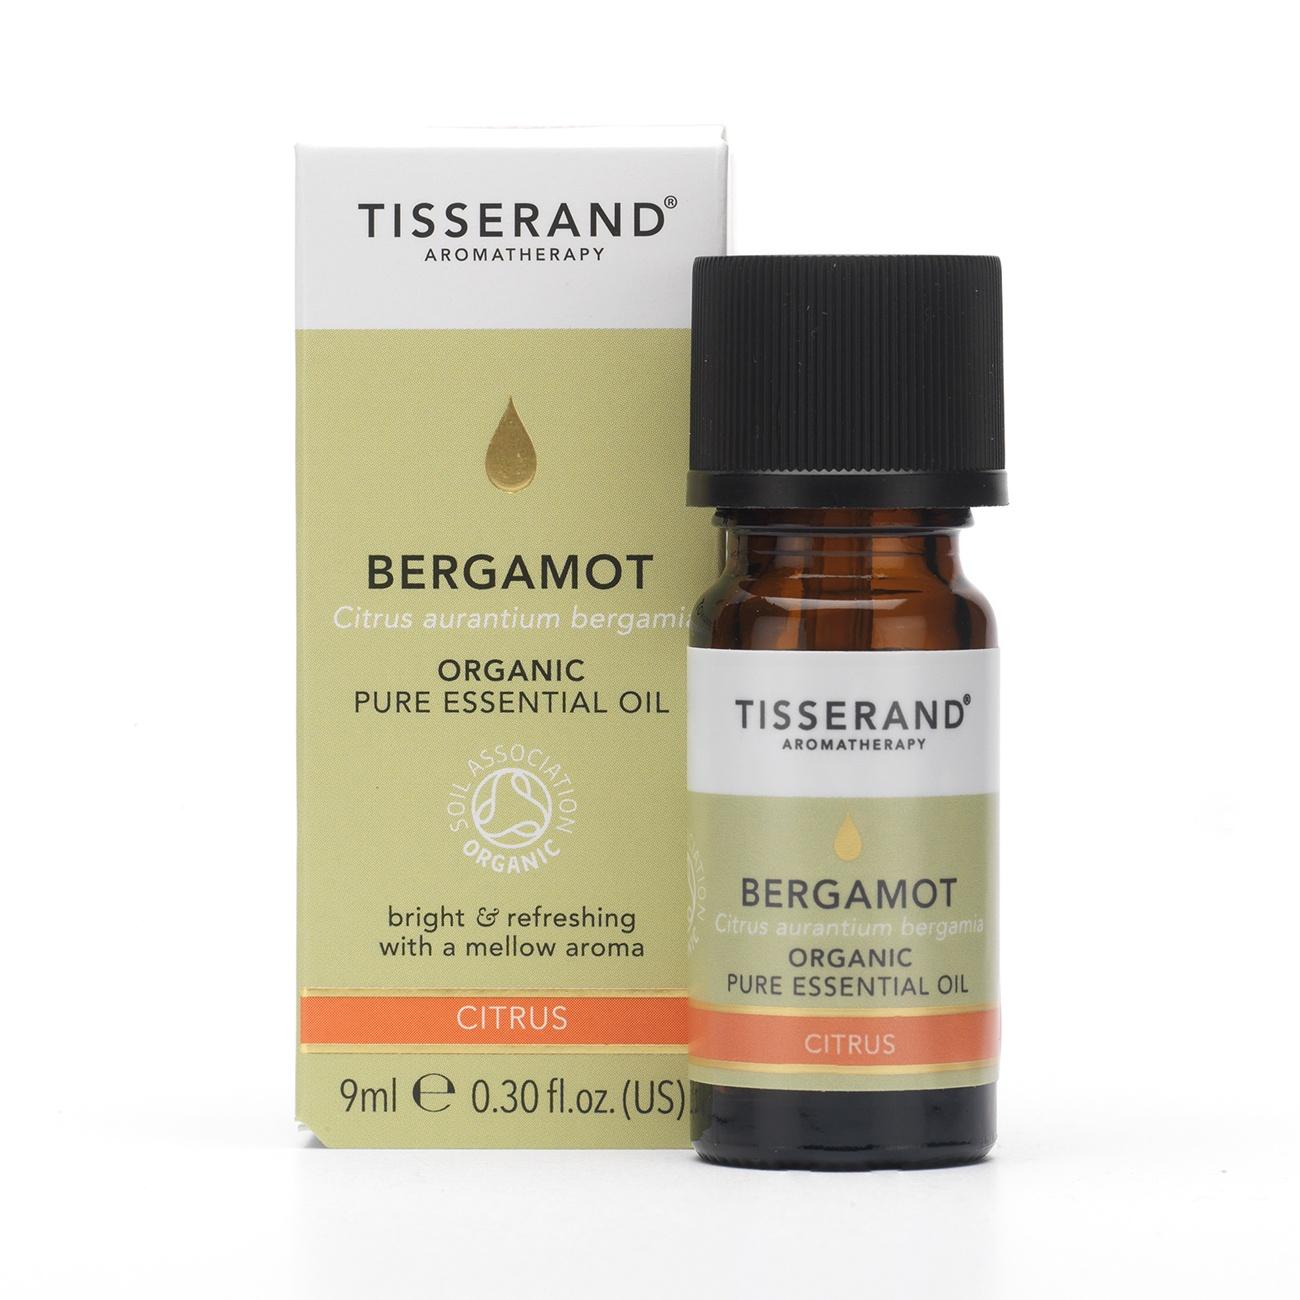 Tisserand Bergamot Organic Essential Oil (9ml)